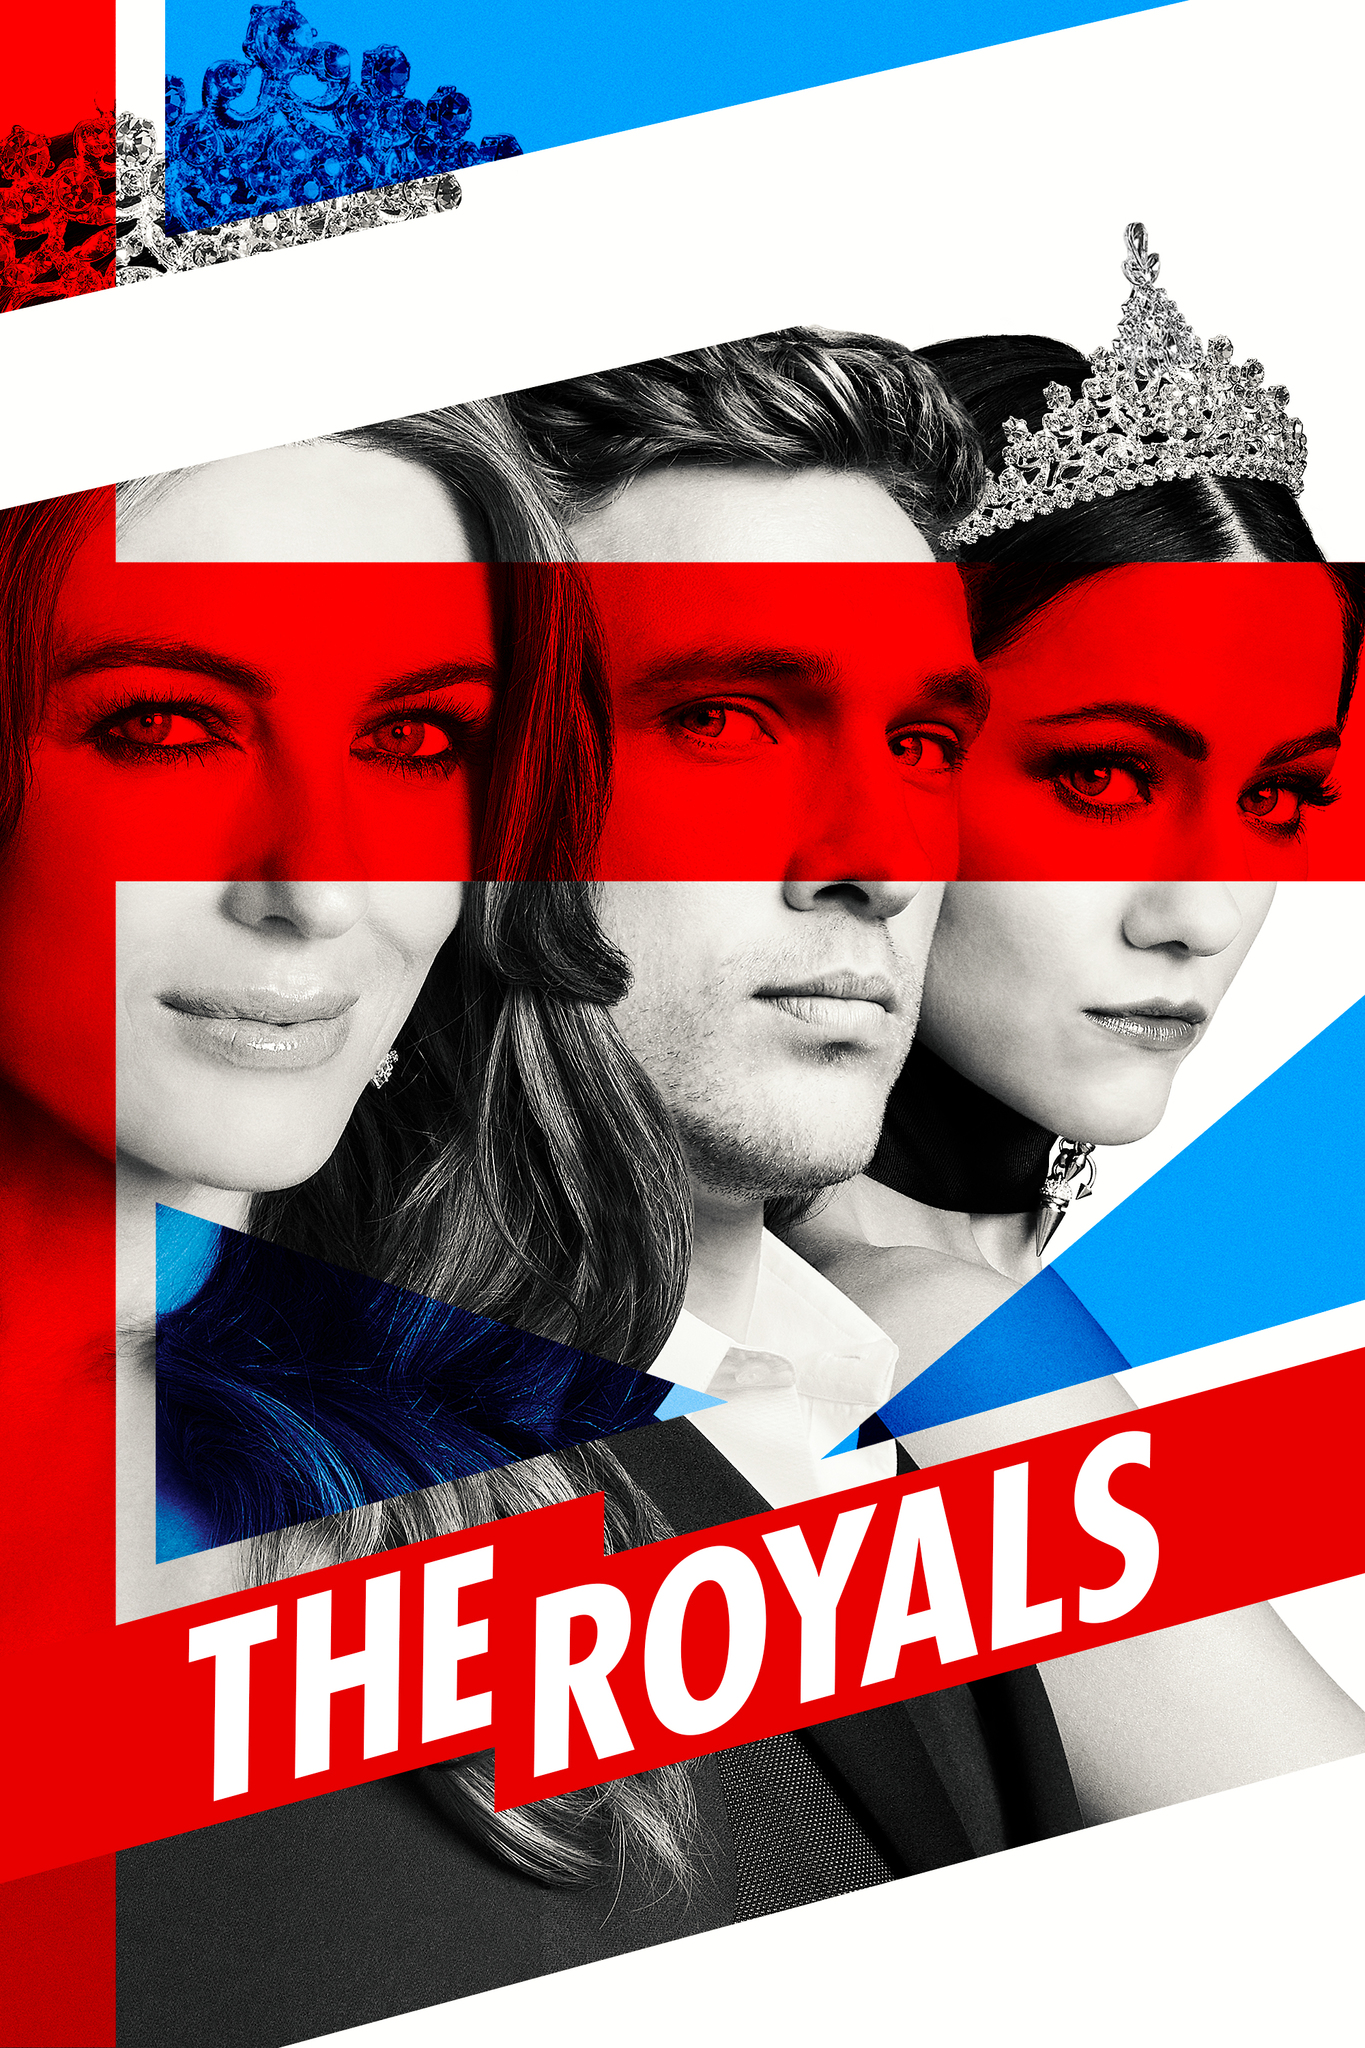 The.Royals.2015.S04E04.German.DL.DUBBED.1080p.WebHD.x264-AIDA